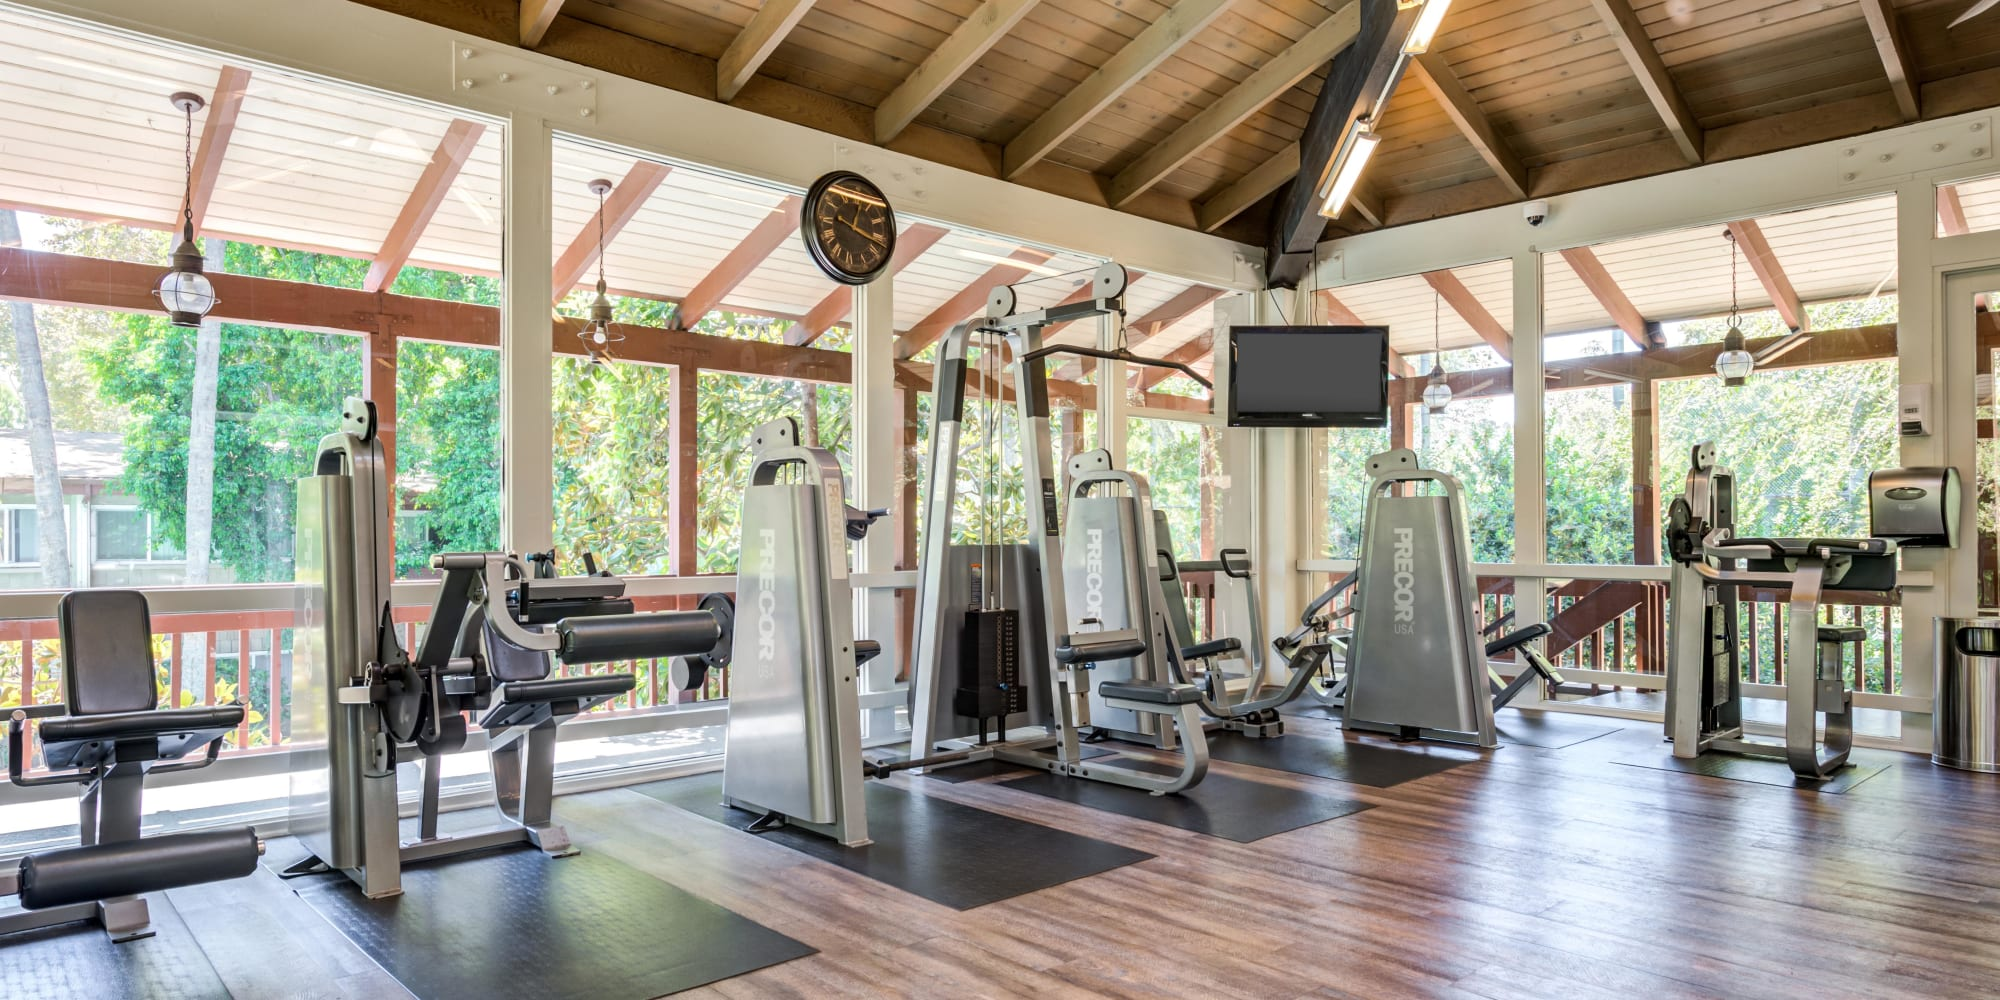 Ample cardio equipment in the fitness center at Rancho Los Feliz in Los Angeles, California